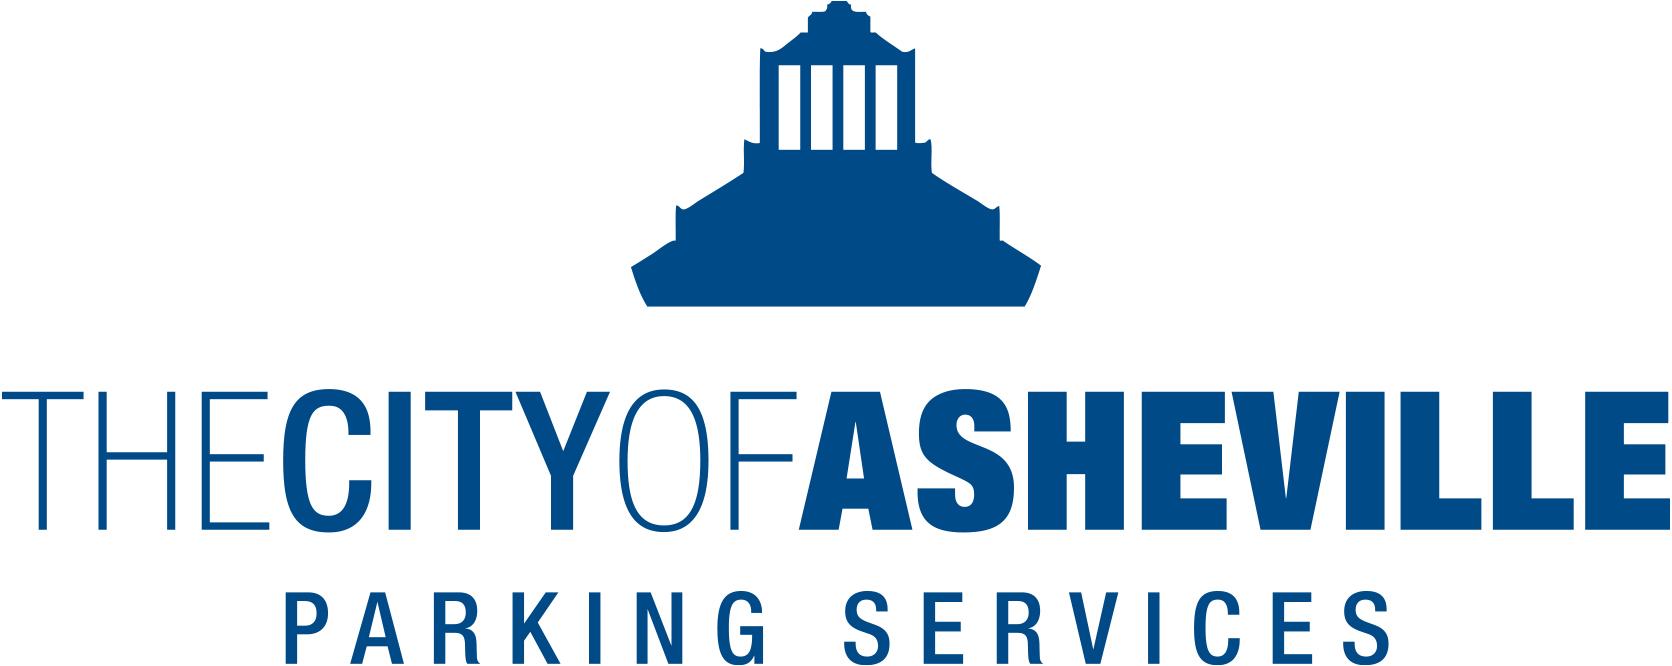 City of Asheville Parking Services